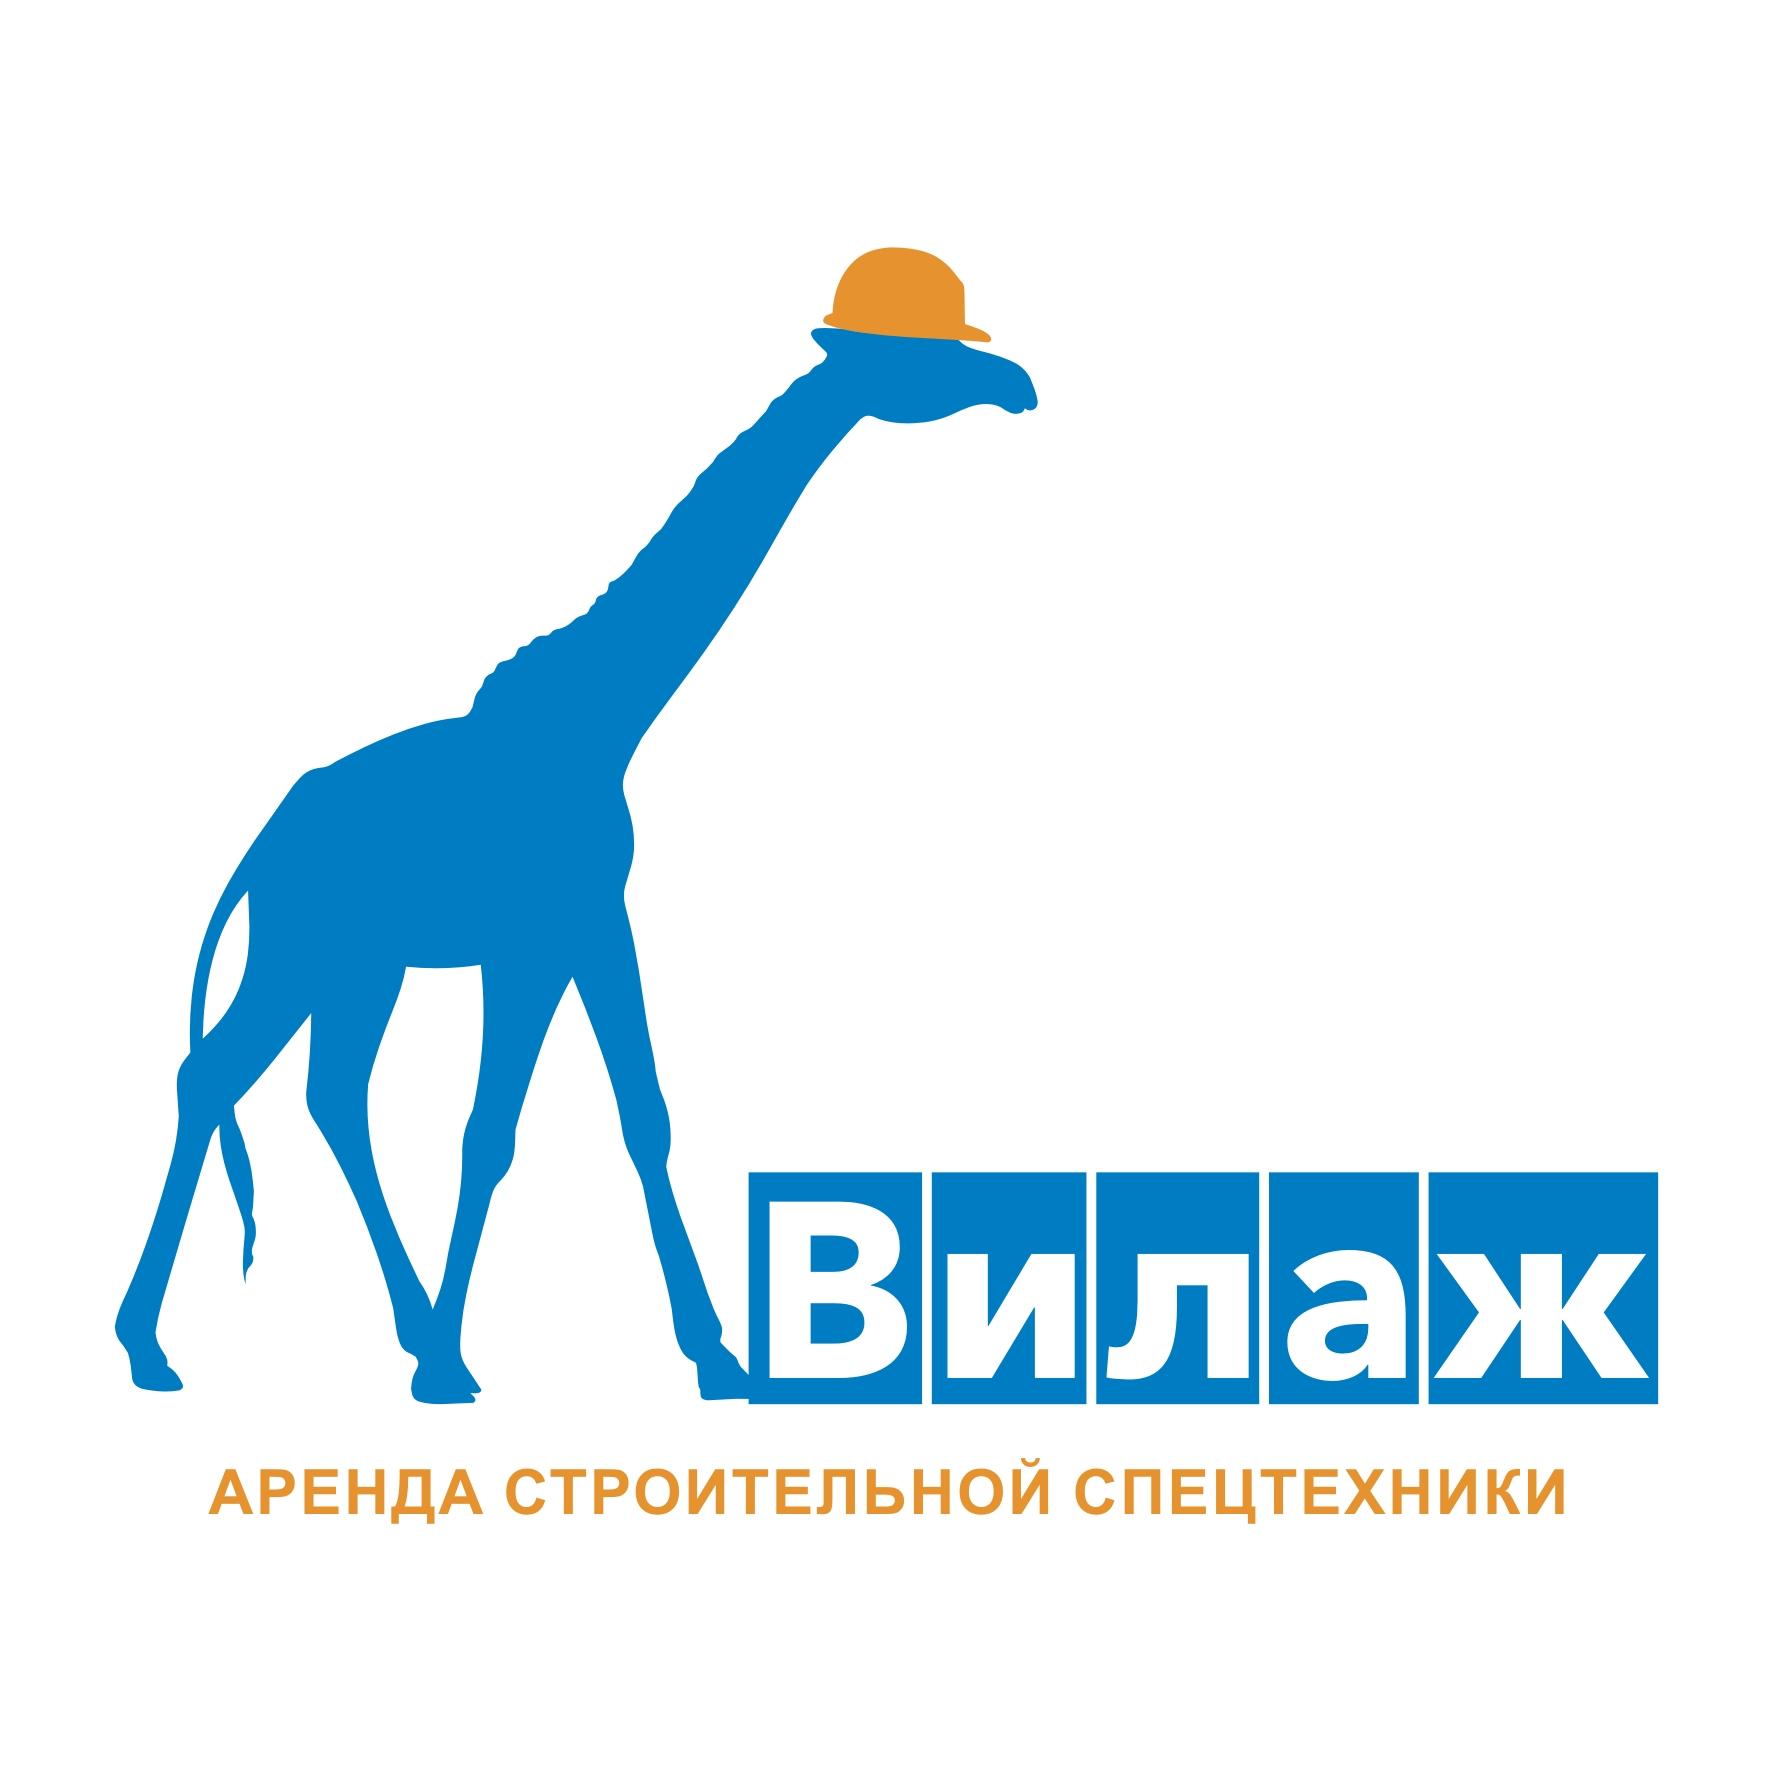 Логотип для компании по аренде спец.техники фото f_6465990612117a40.jpg